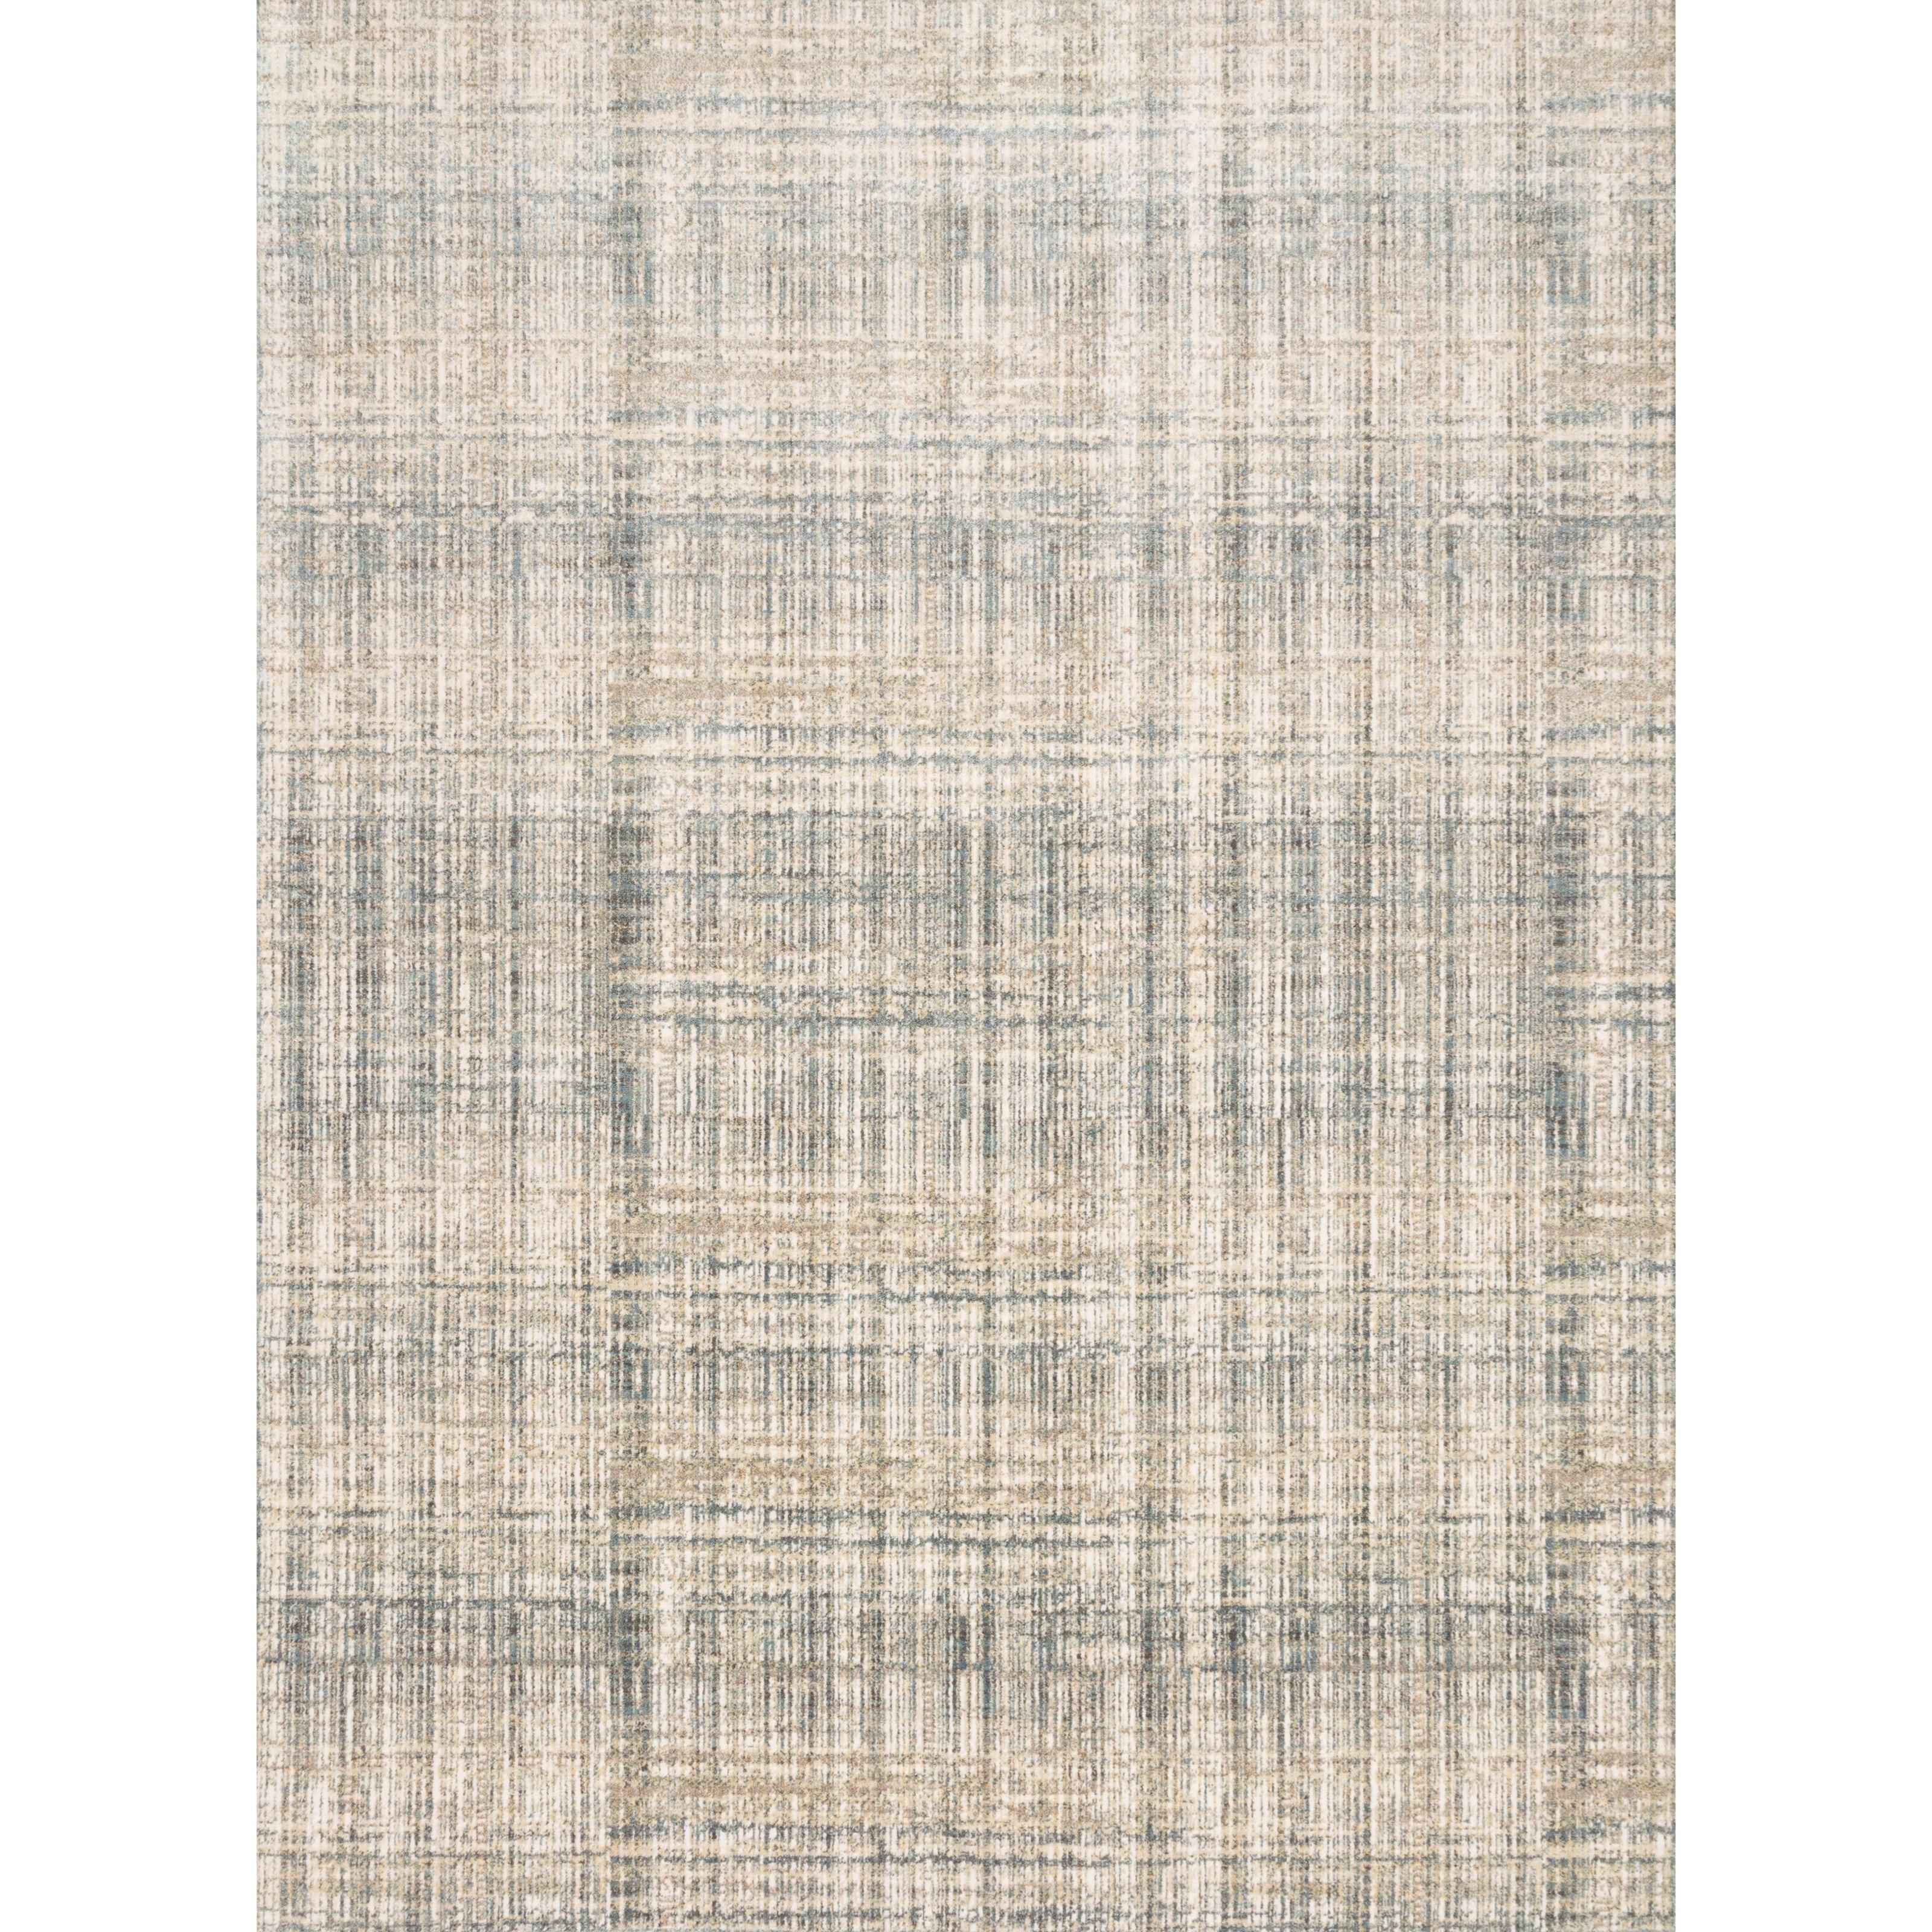 "Reid 6'7"" x 9'2"" Bluestone Rug by Loloi Rugs at Virginia Furniture Market"